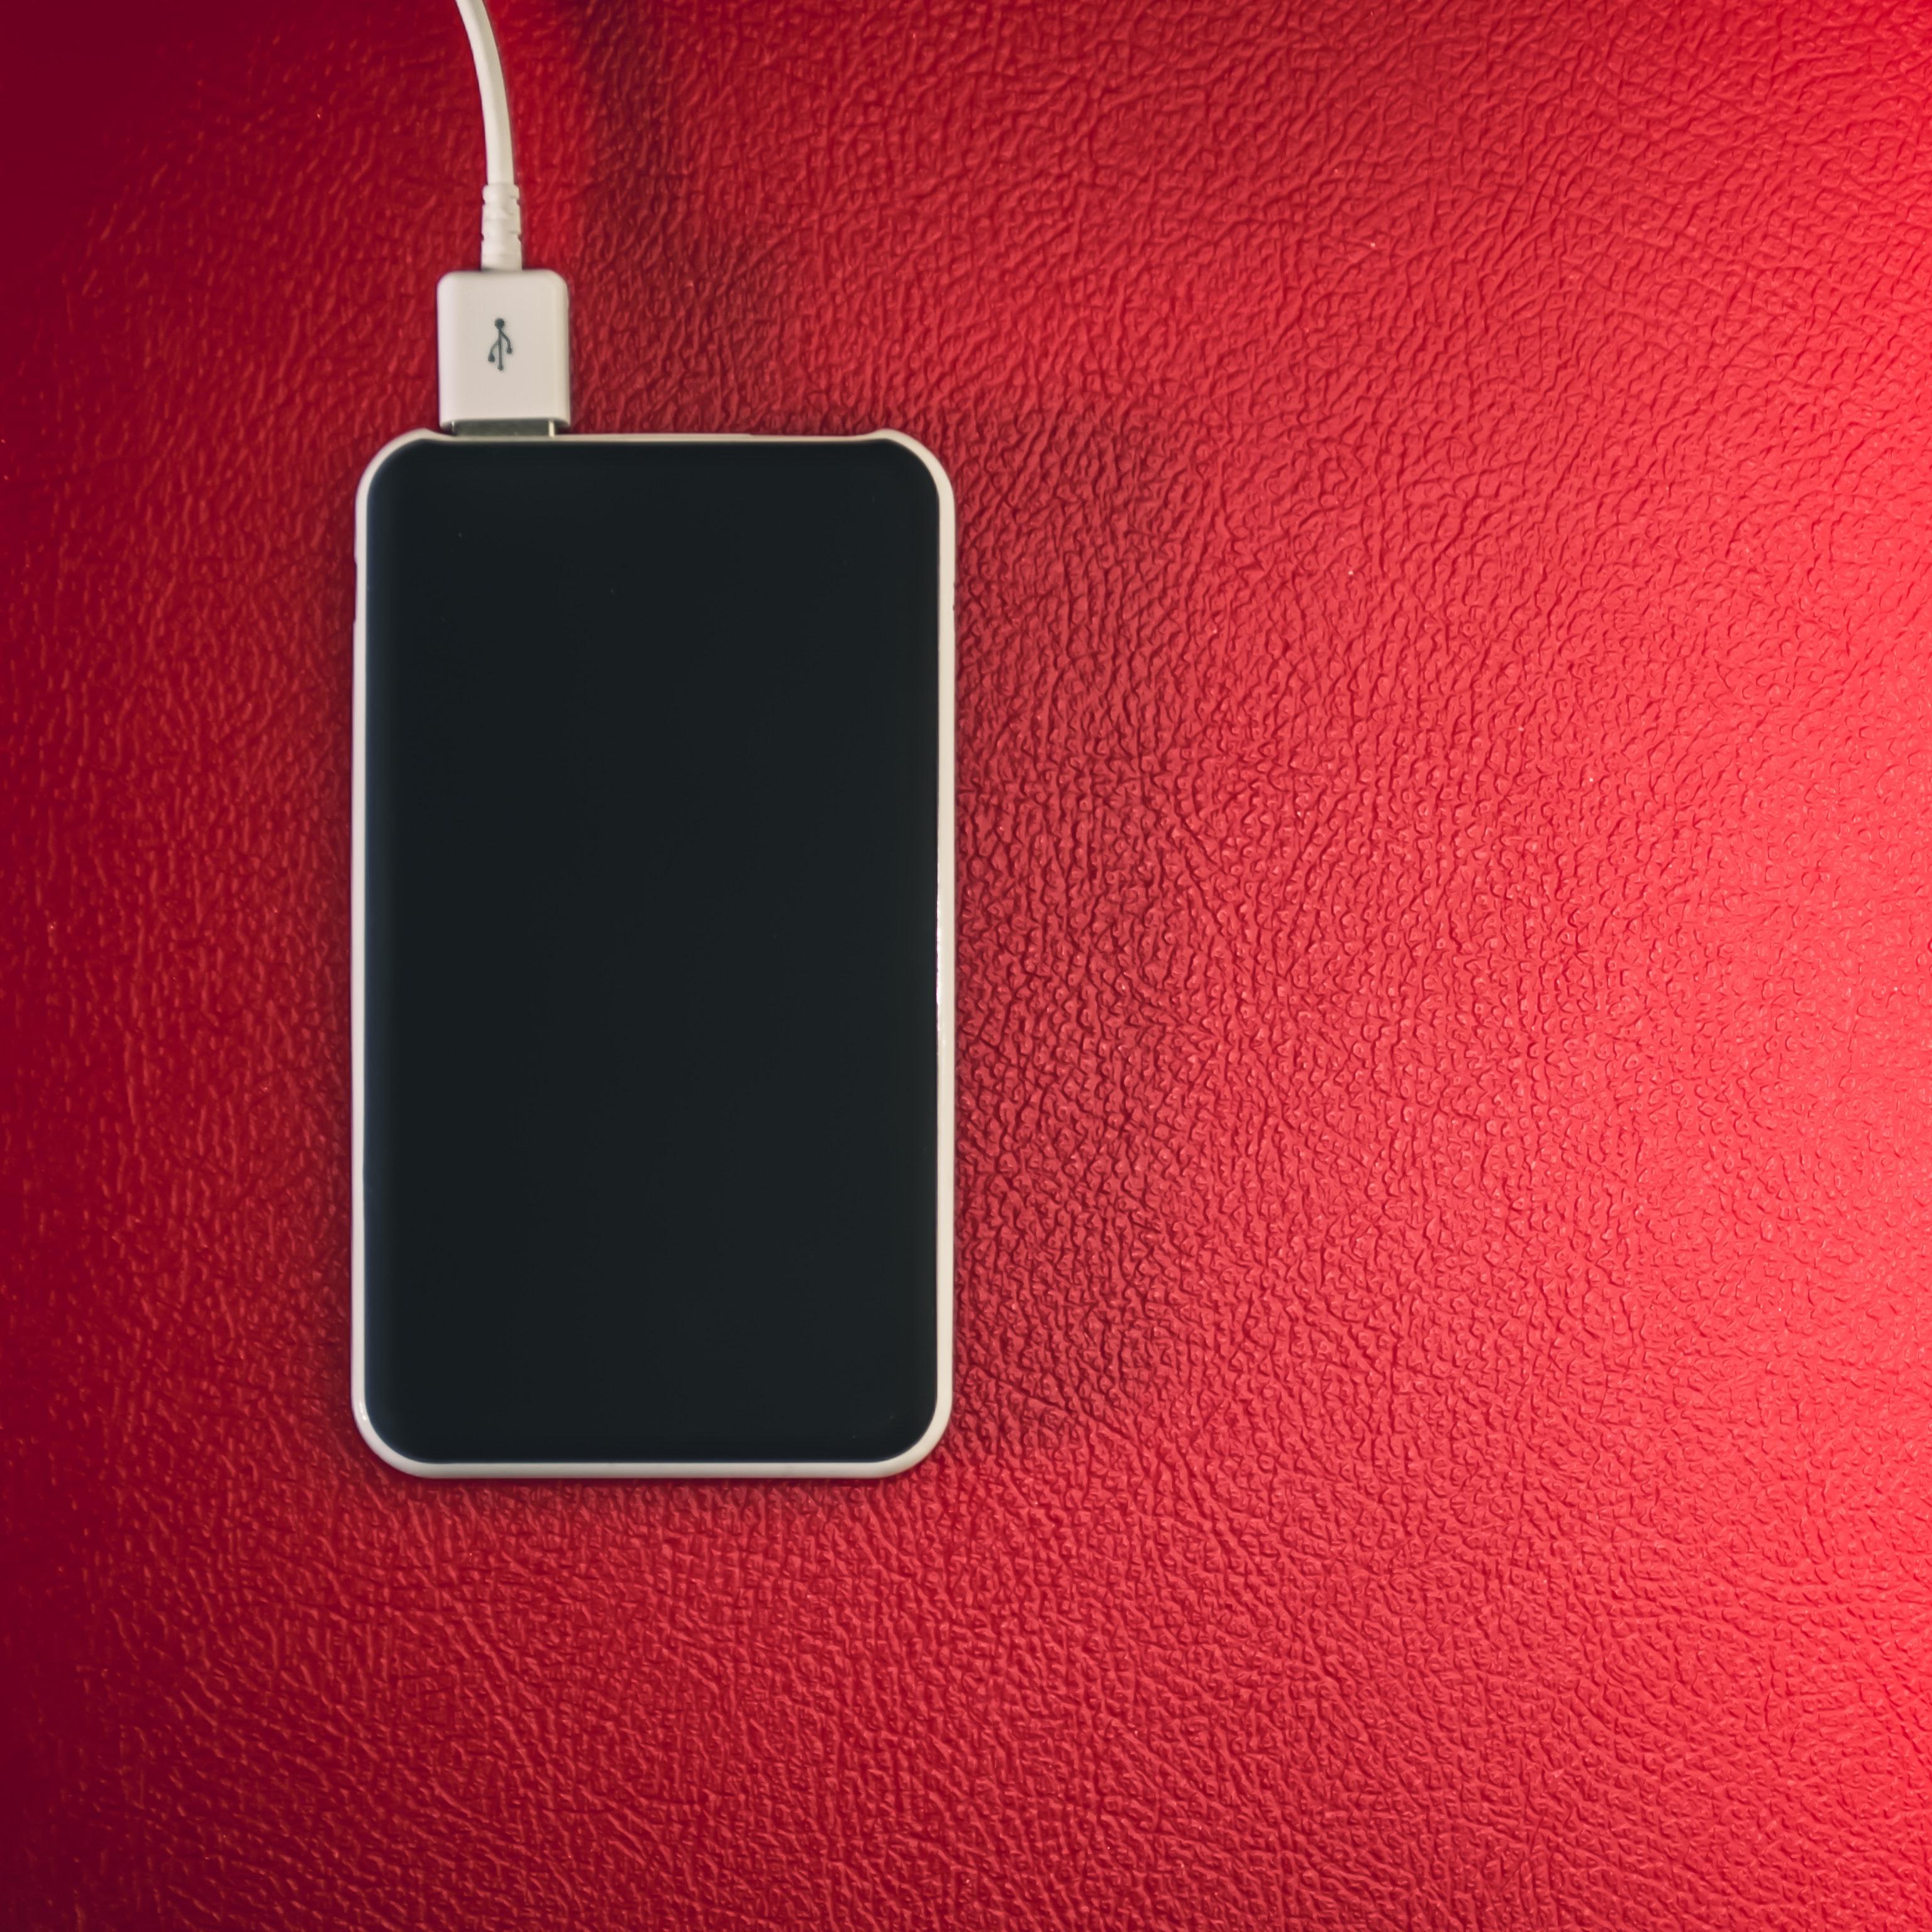 Black and white smartphone photo